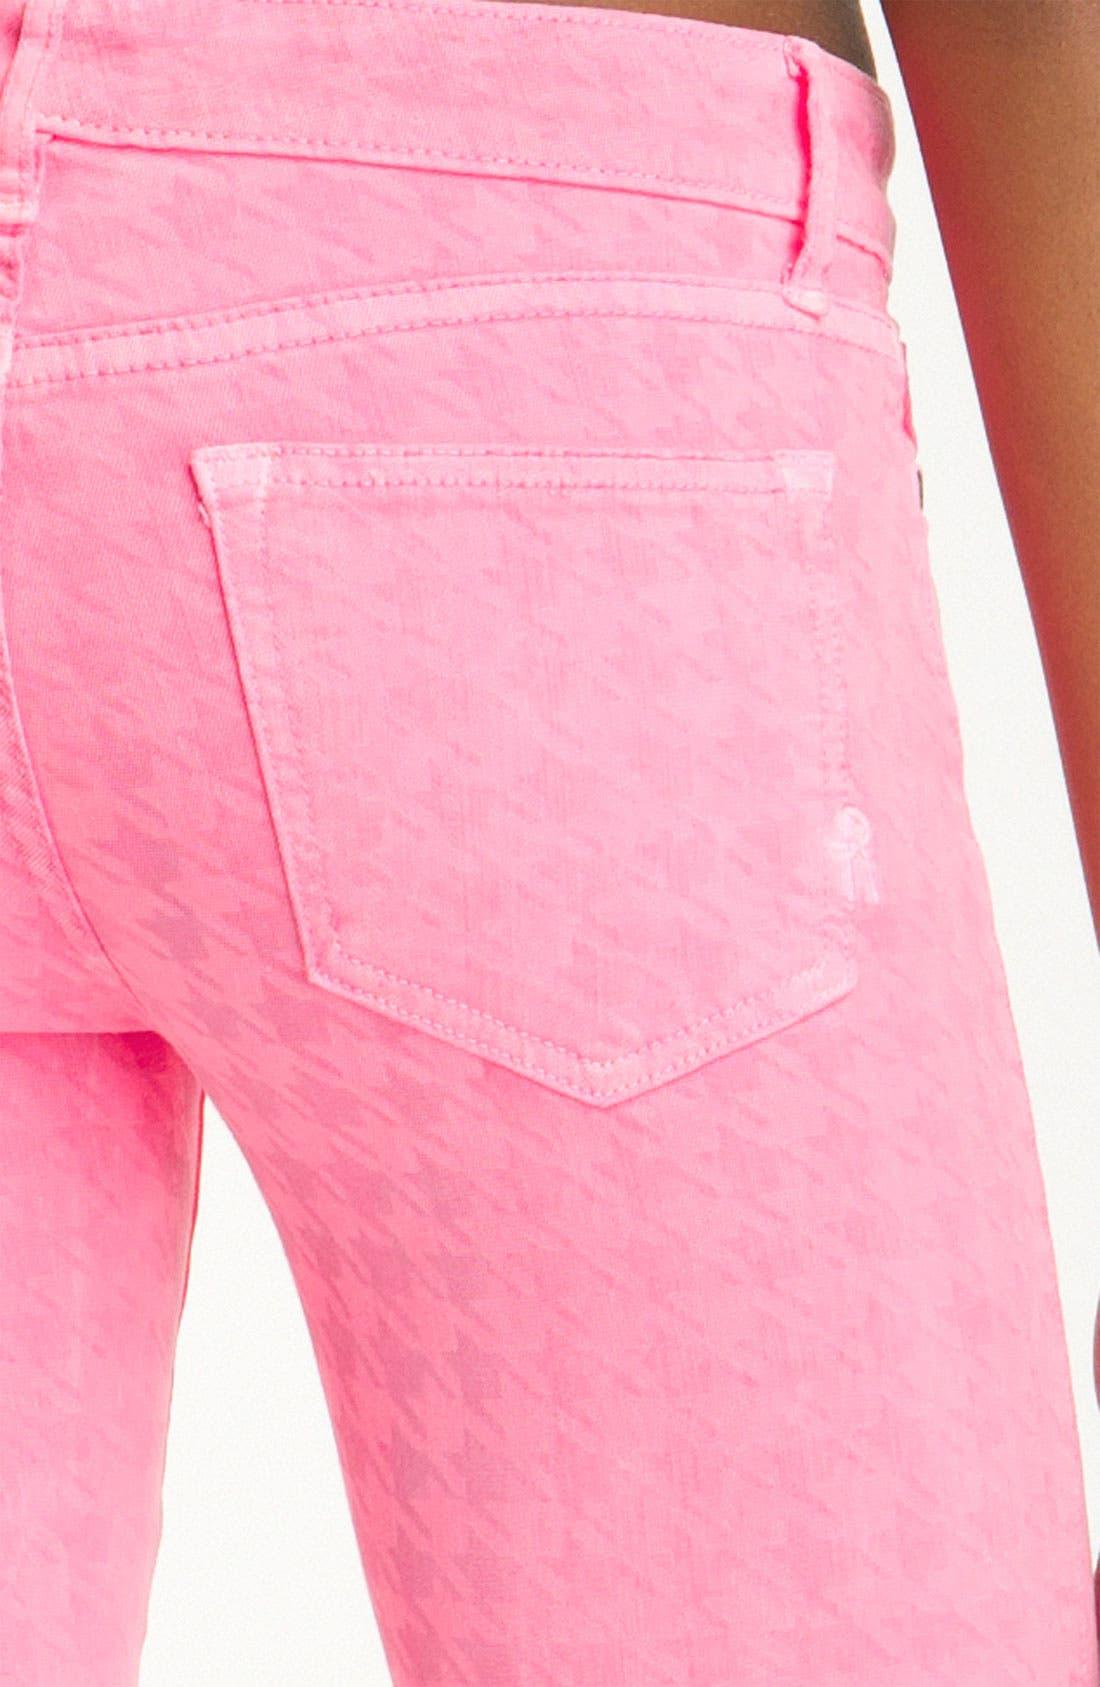 Alternate Image 3  - Rich & Skinny 'Legacy' Houndstooth Print Skinny Jeans (Neon Pink)